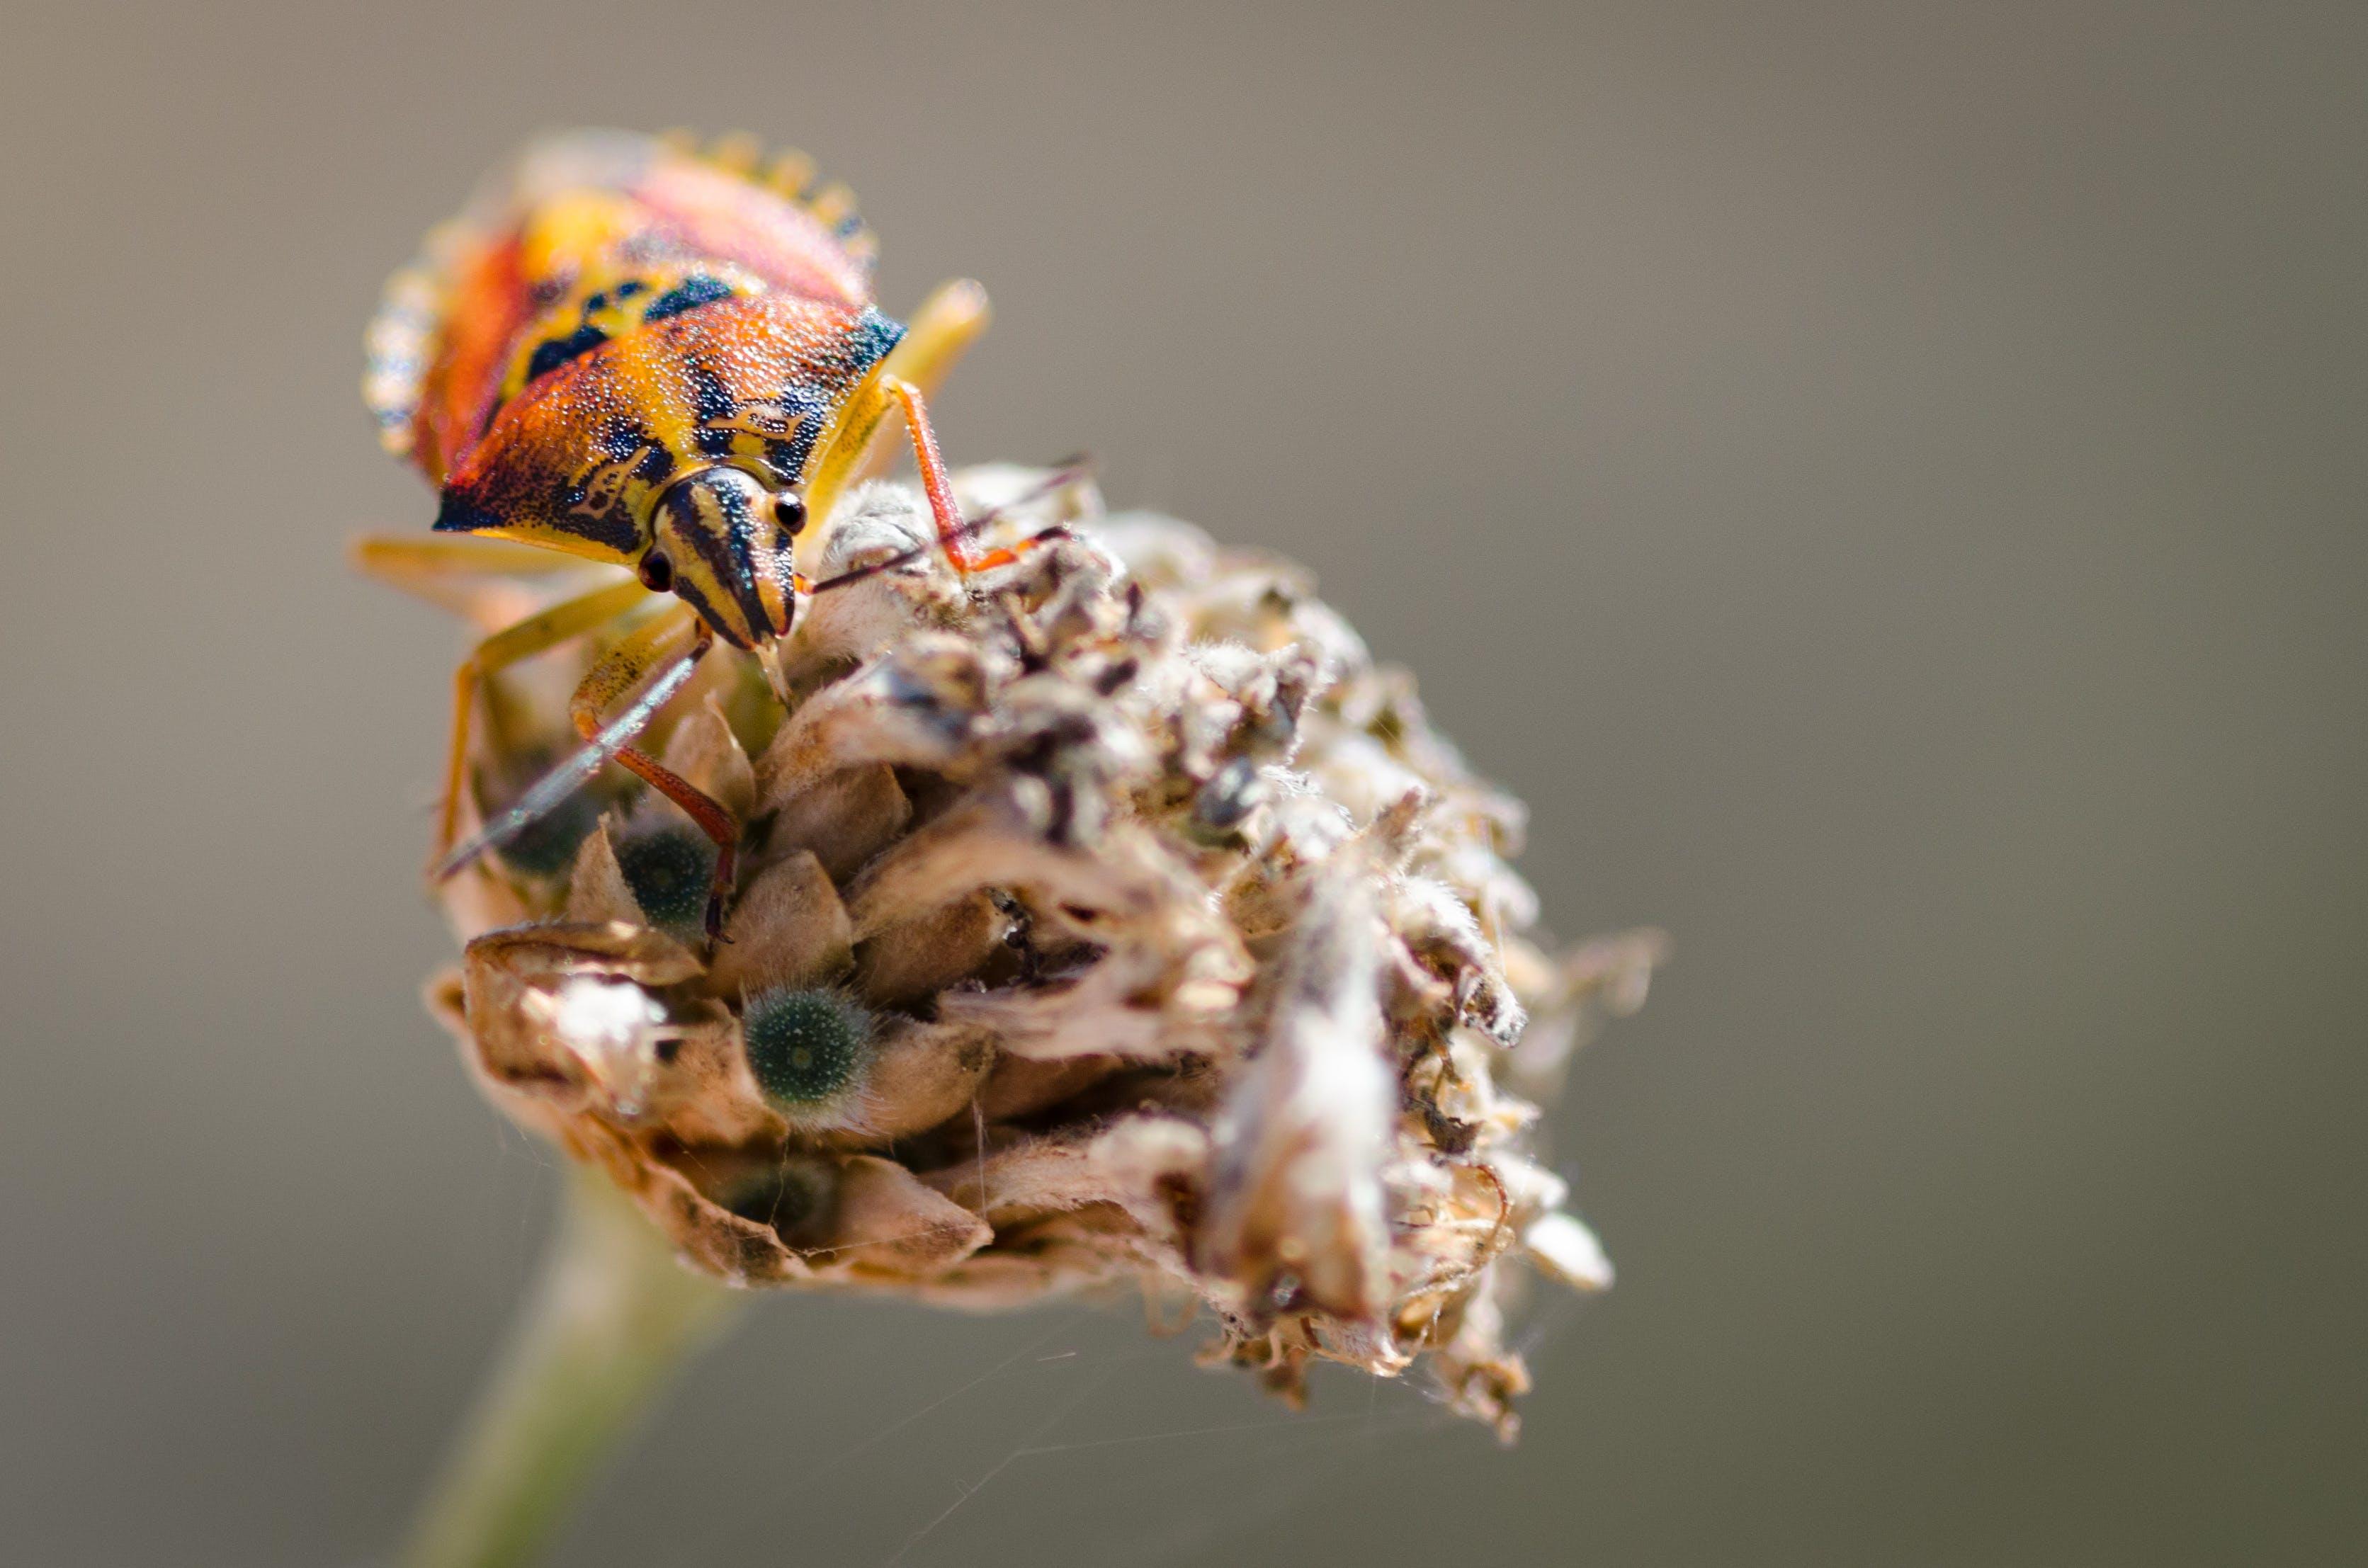 Free stock photo of animal, beetle, bug, close-up